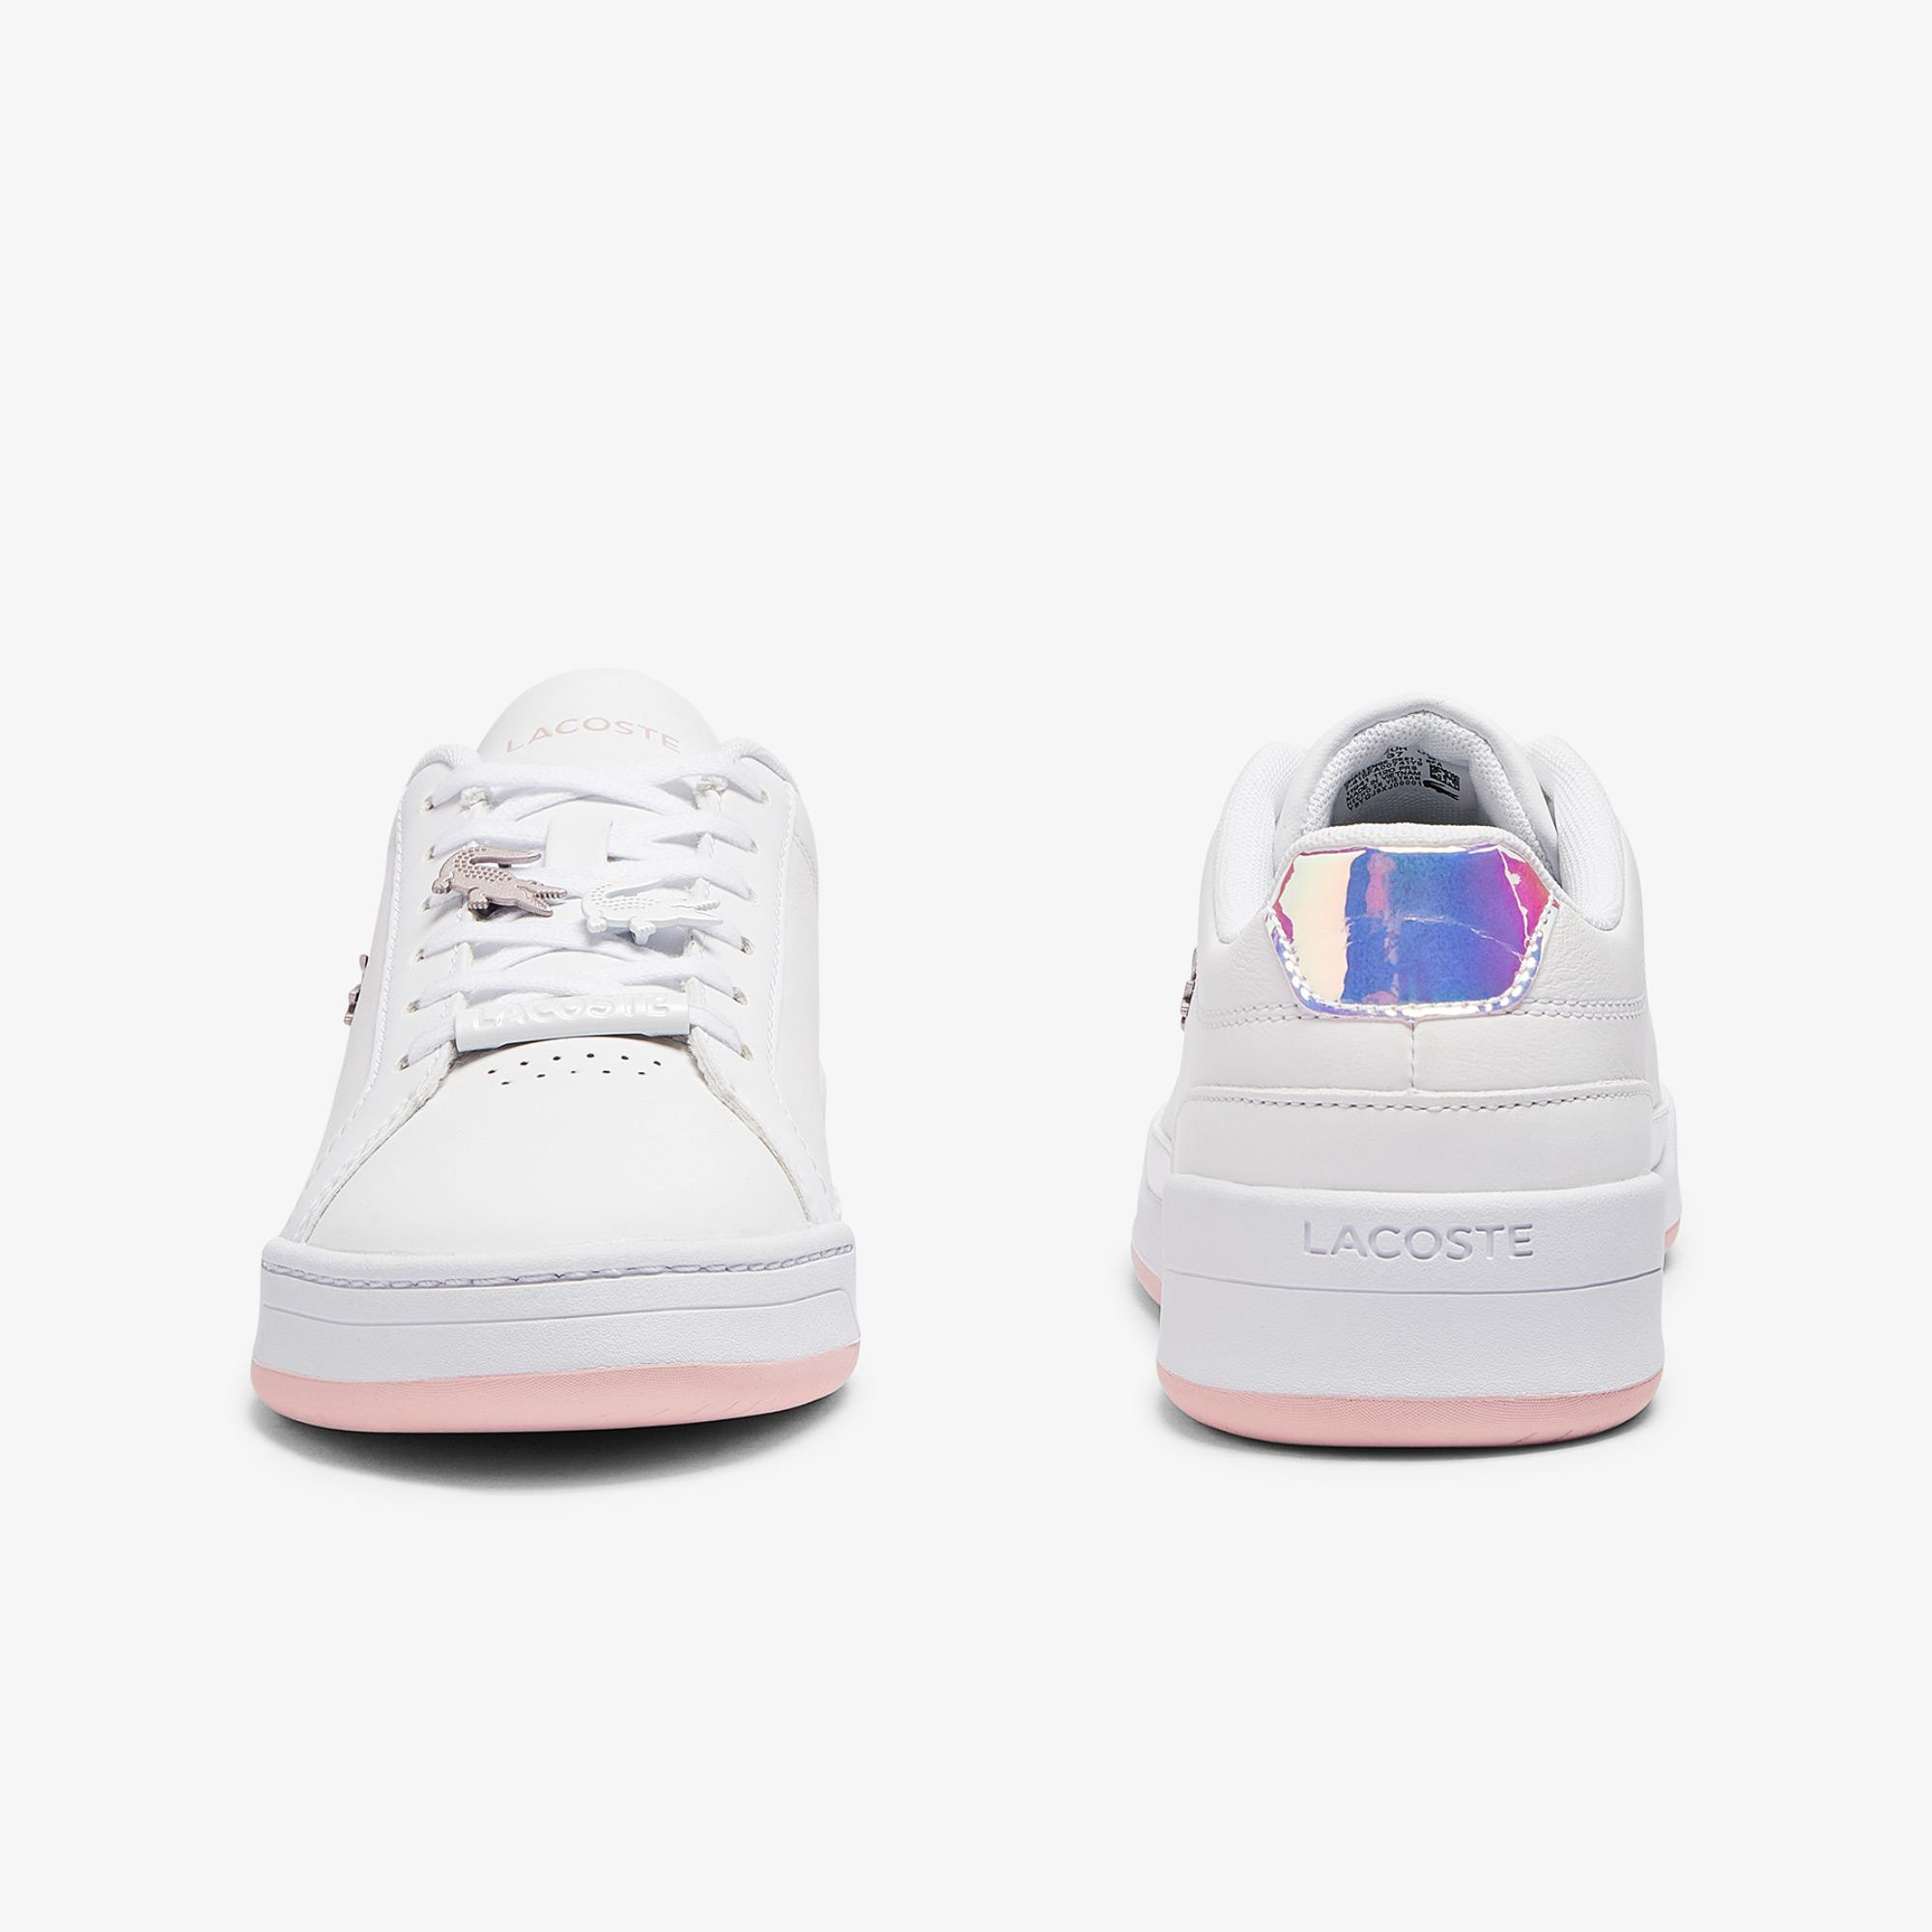 Lacoste Challenge 0921 1 Sfa Kadın Beyaz - Açık Pembe Sneaker